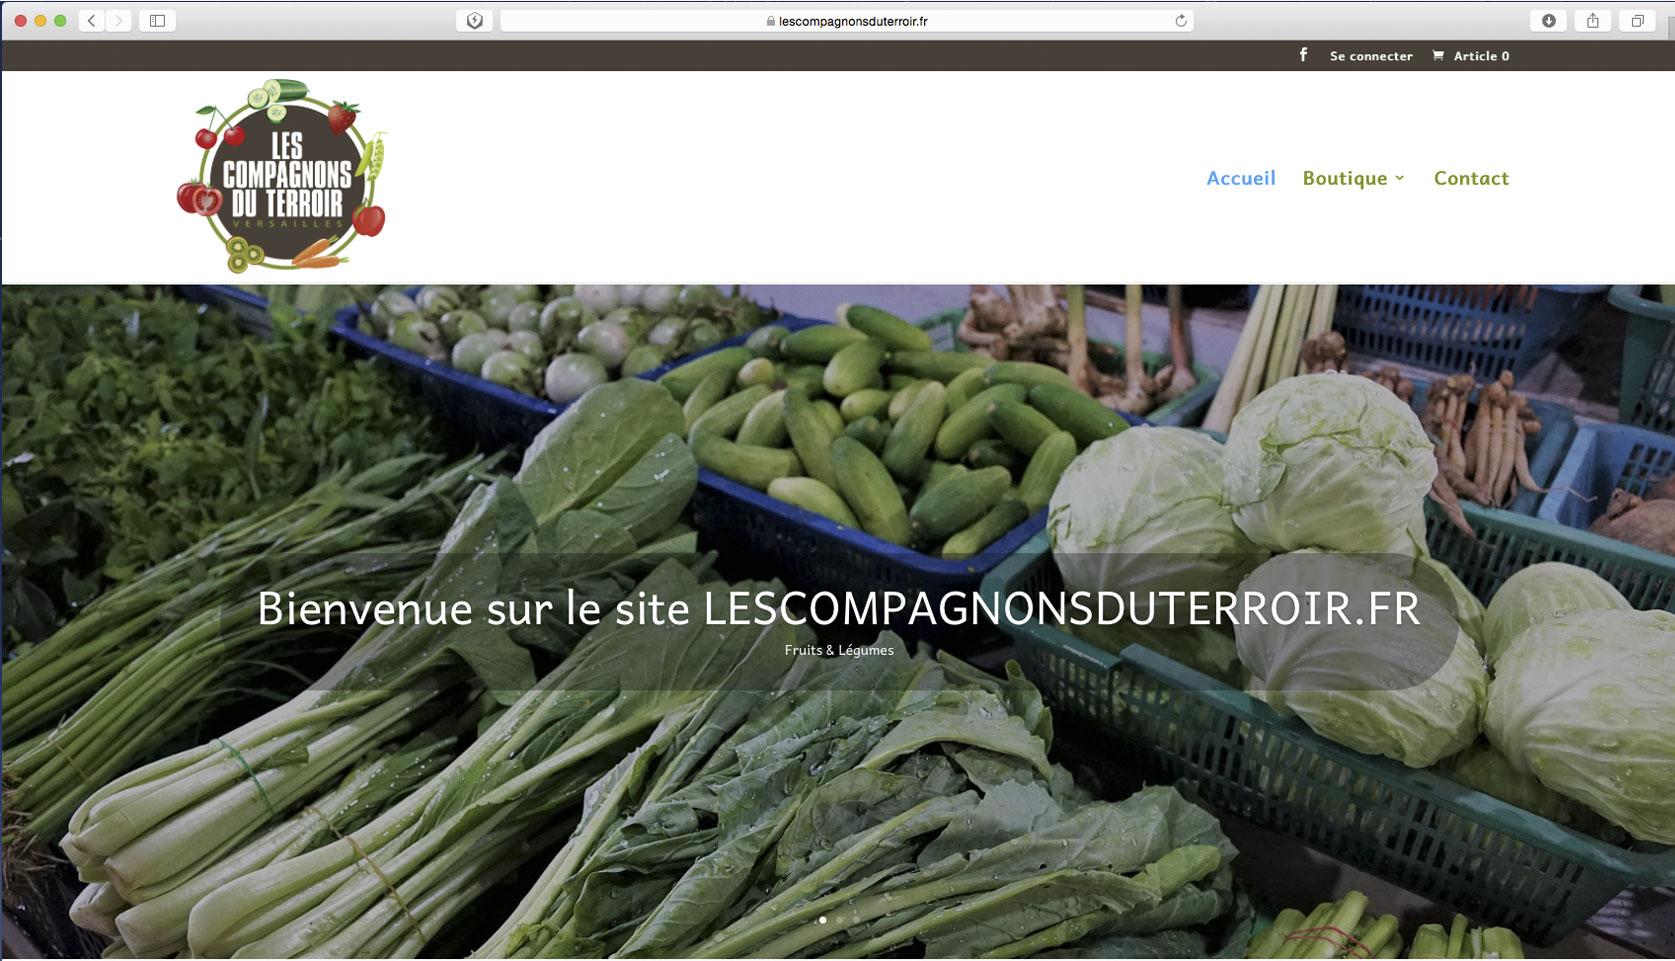 Visuel site lescompagnonsduterroir